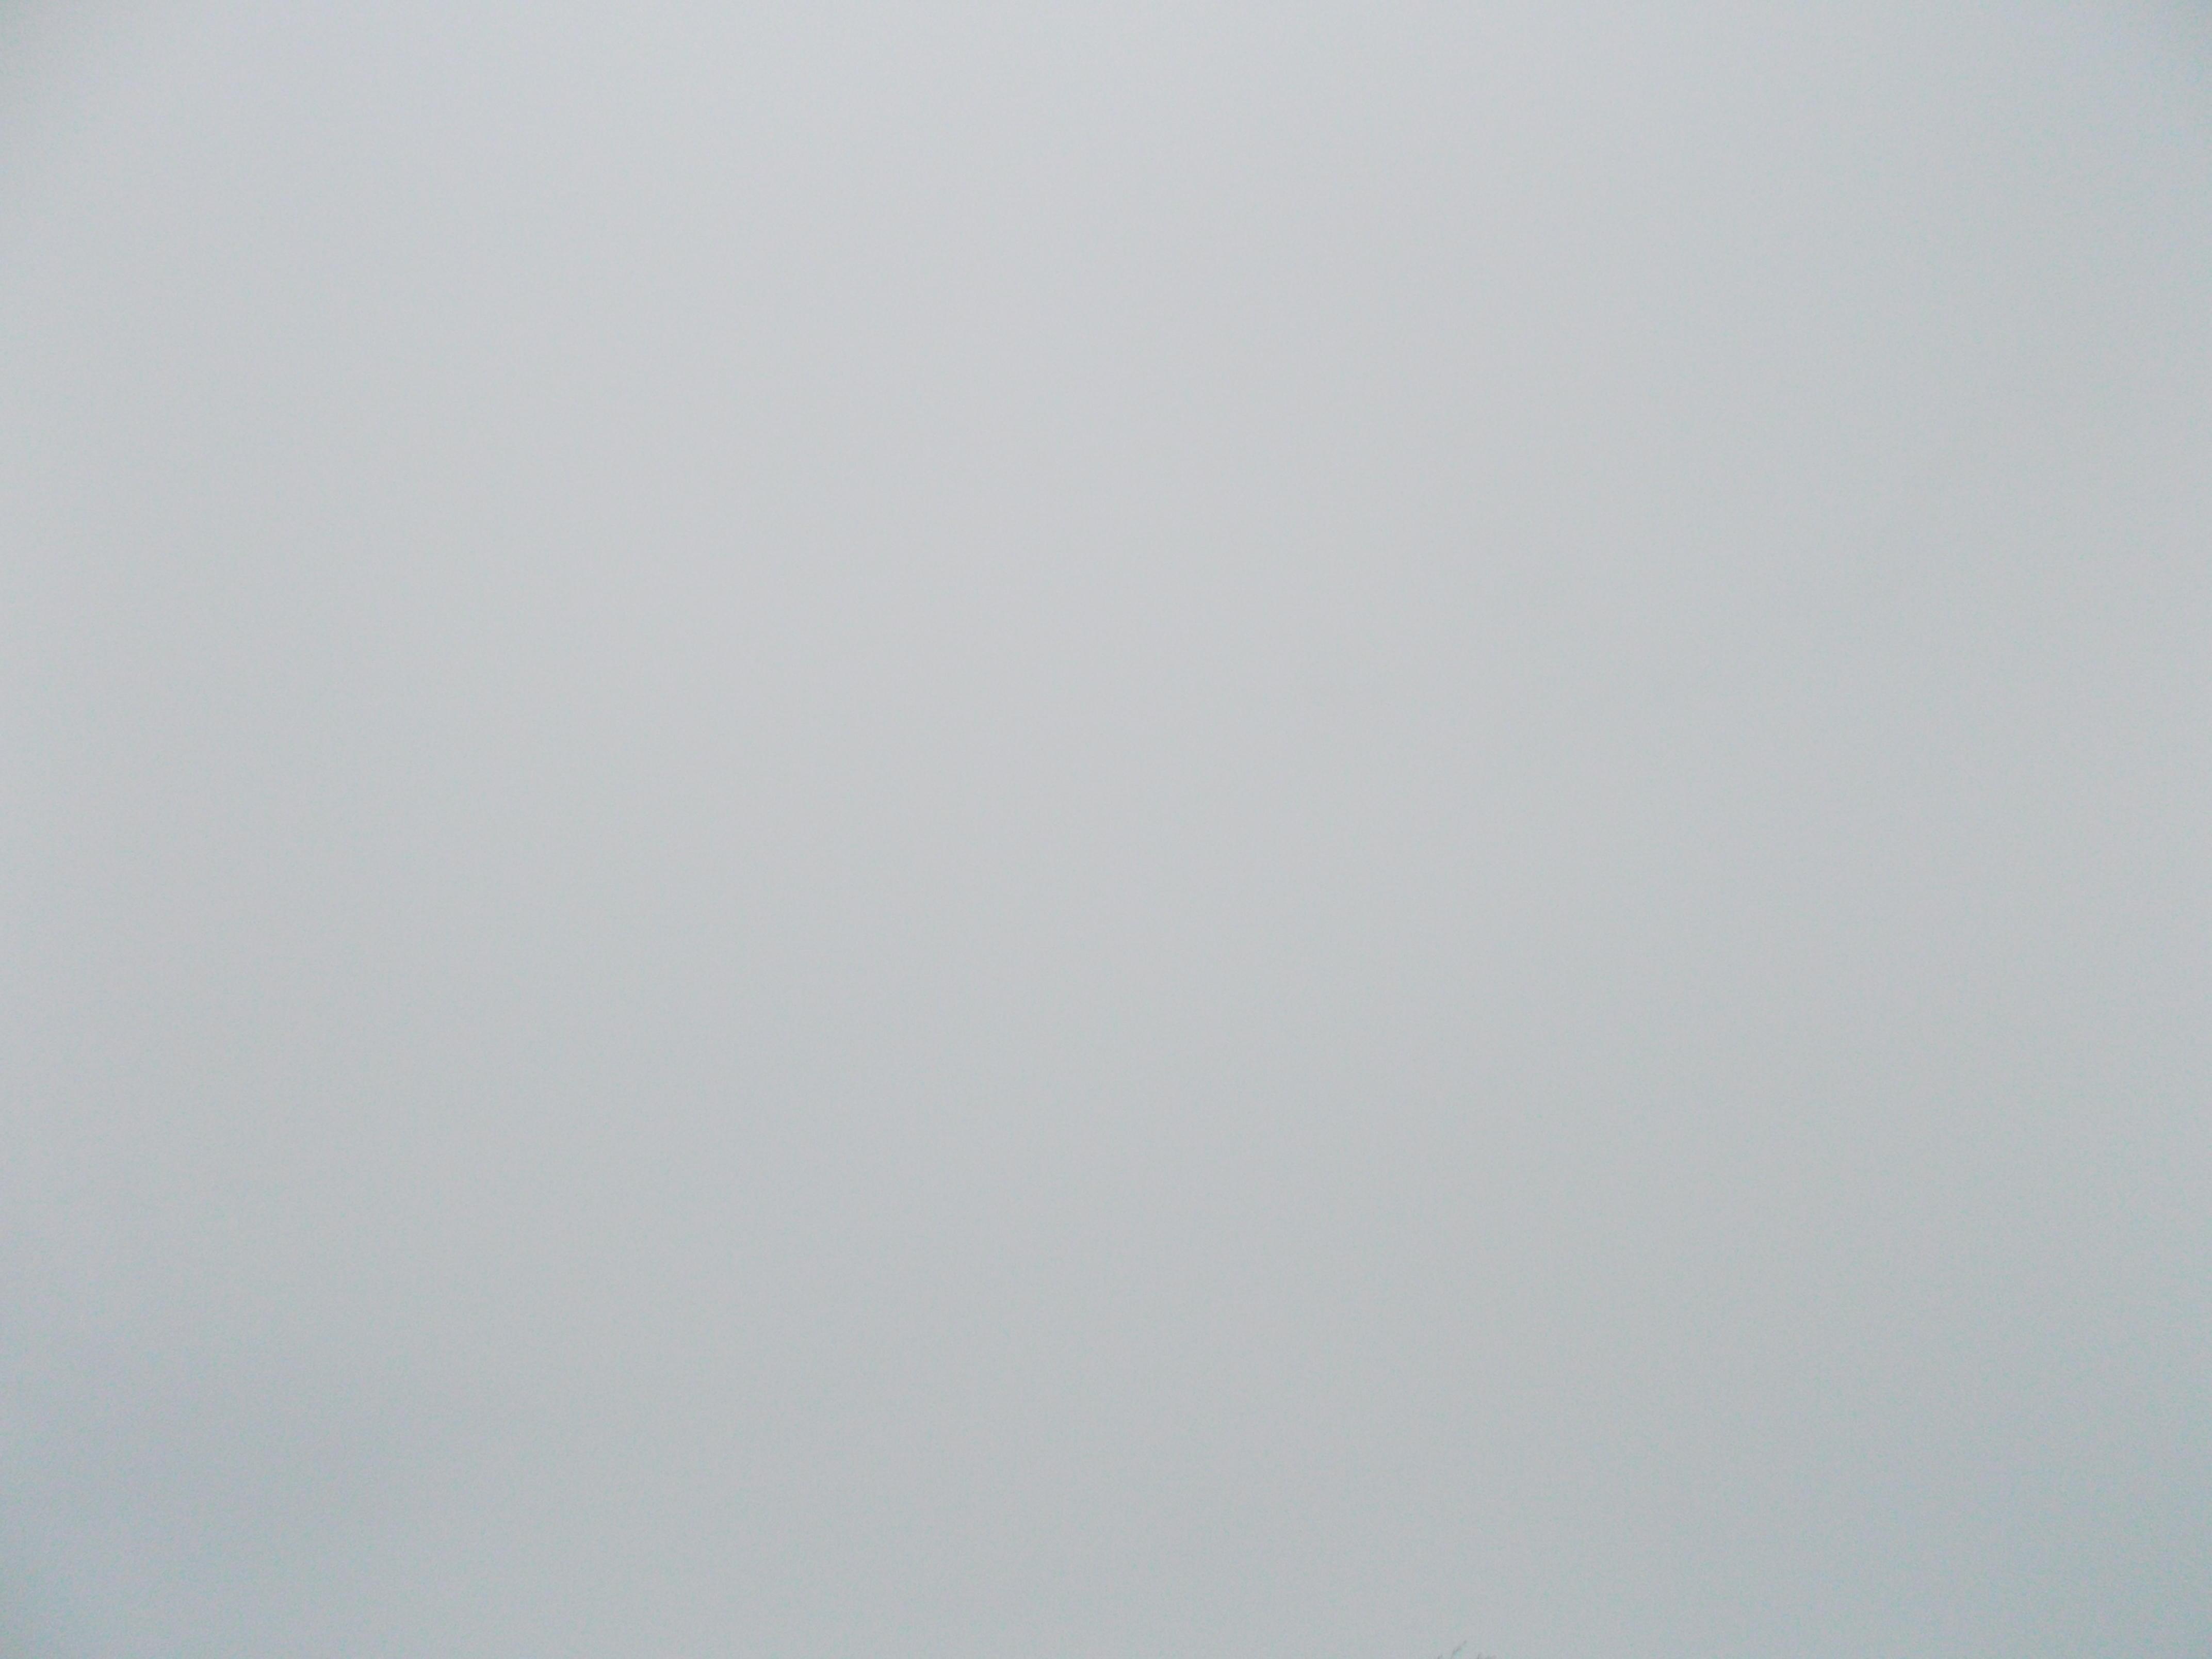 2013-02-08 Longitude -0.371 Latitude 49.182 Altitude 13 Heure 11h44